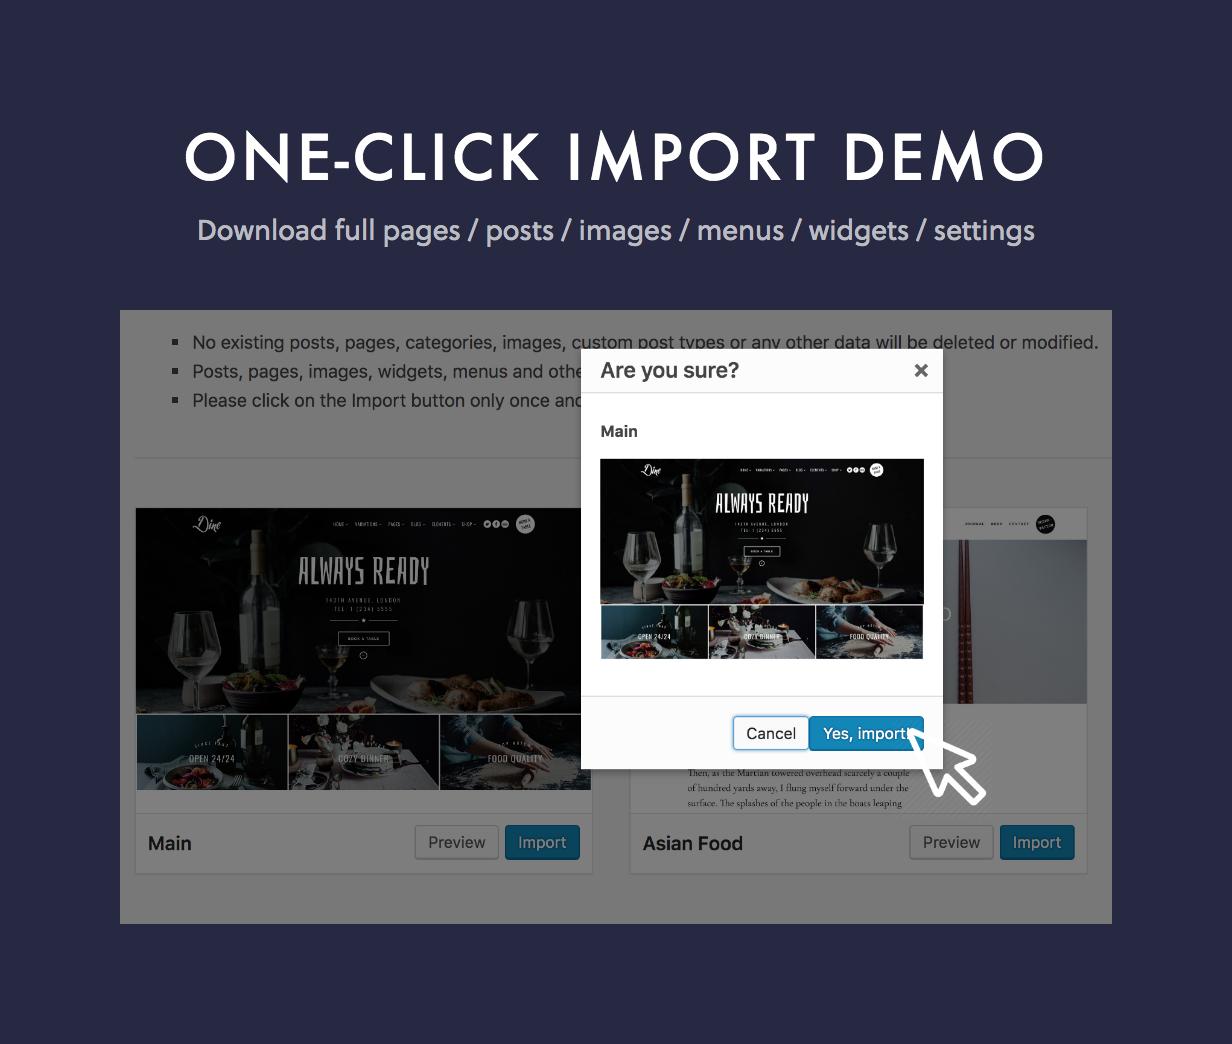 Dine One Click Import Demo